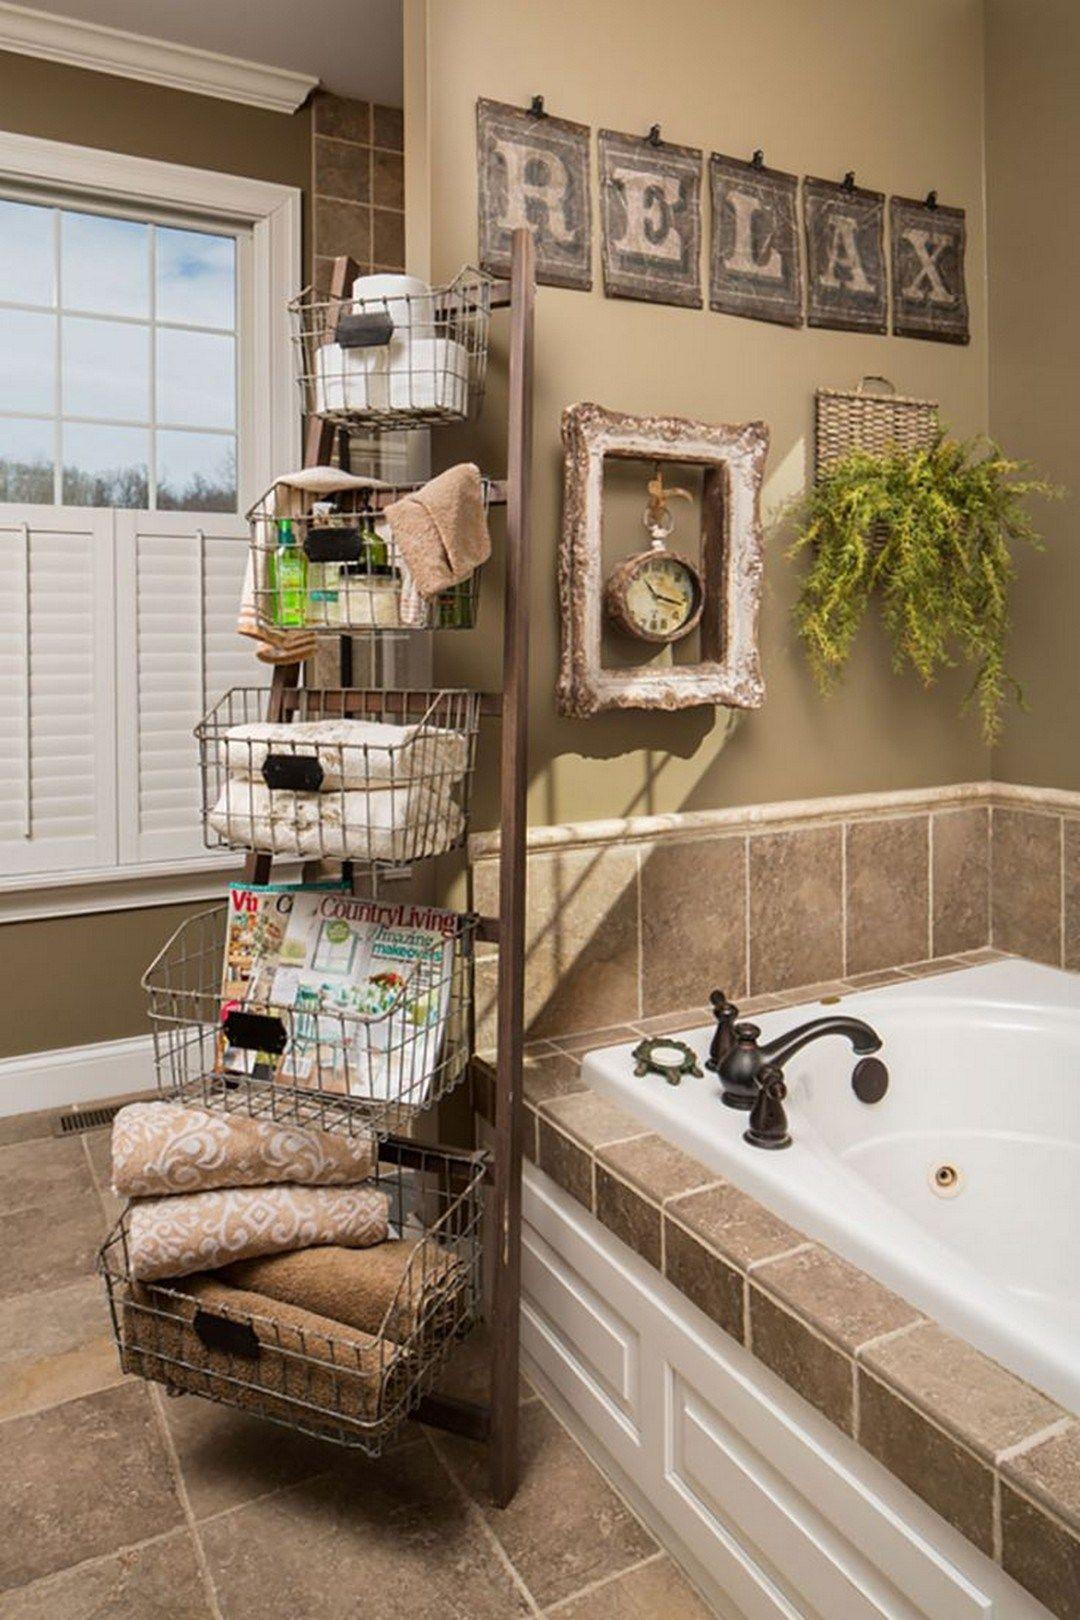 Rustikales badezimmer dekor diy  incredible diy for rustic home decor   deco  pinterest